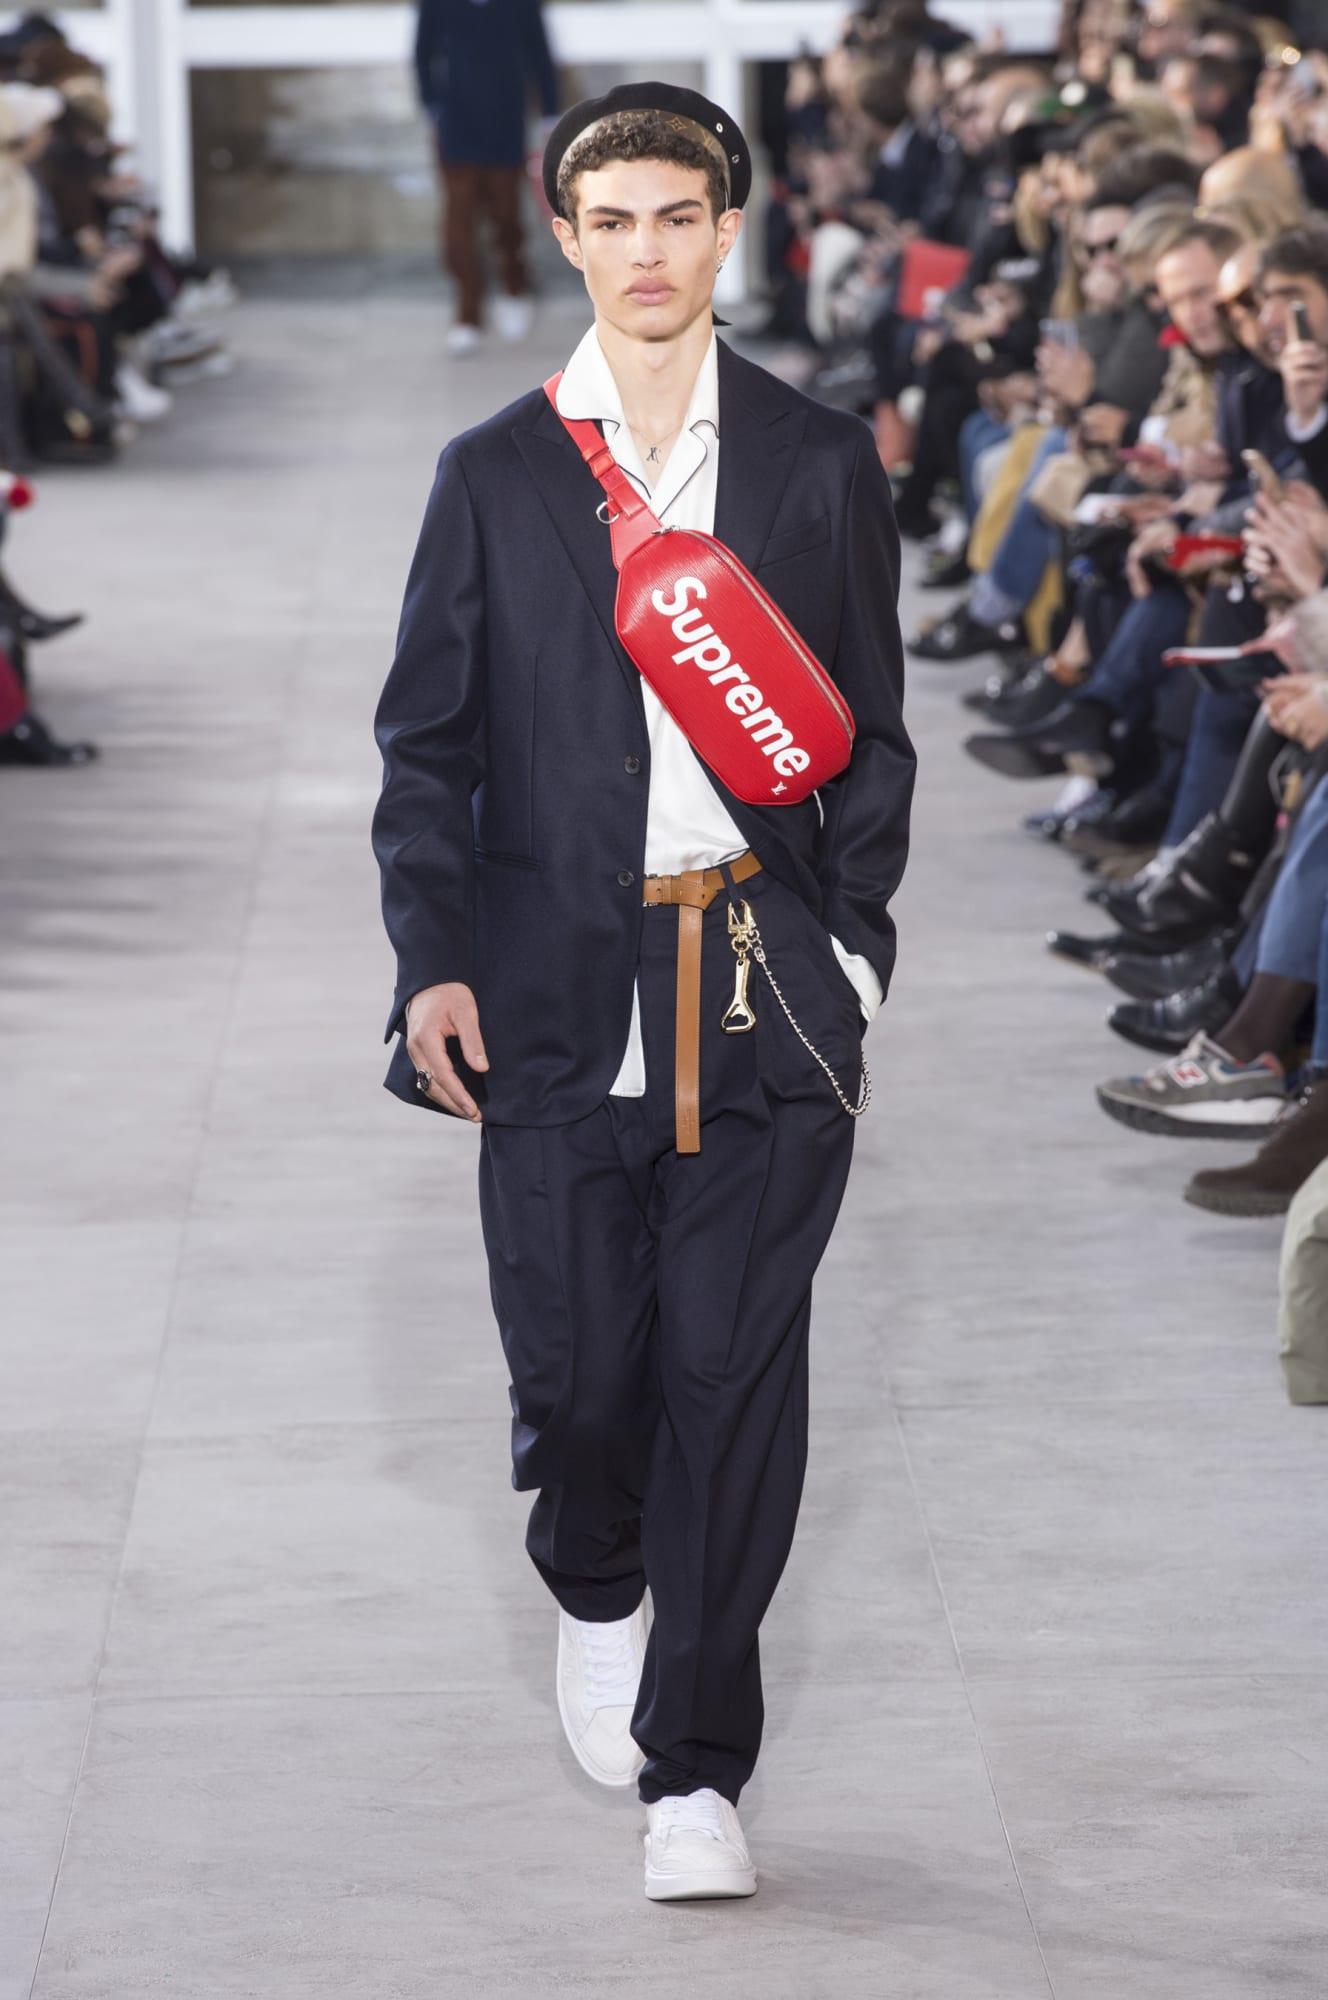 bst supreme x louis vuitton 2017 phong cách thời trang streetwear